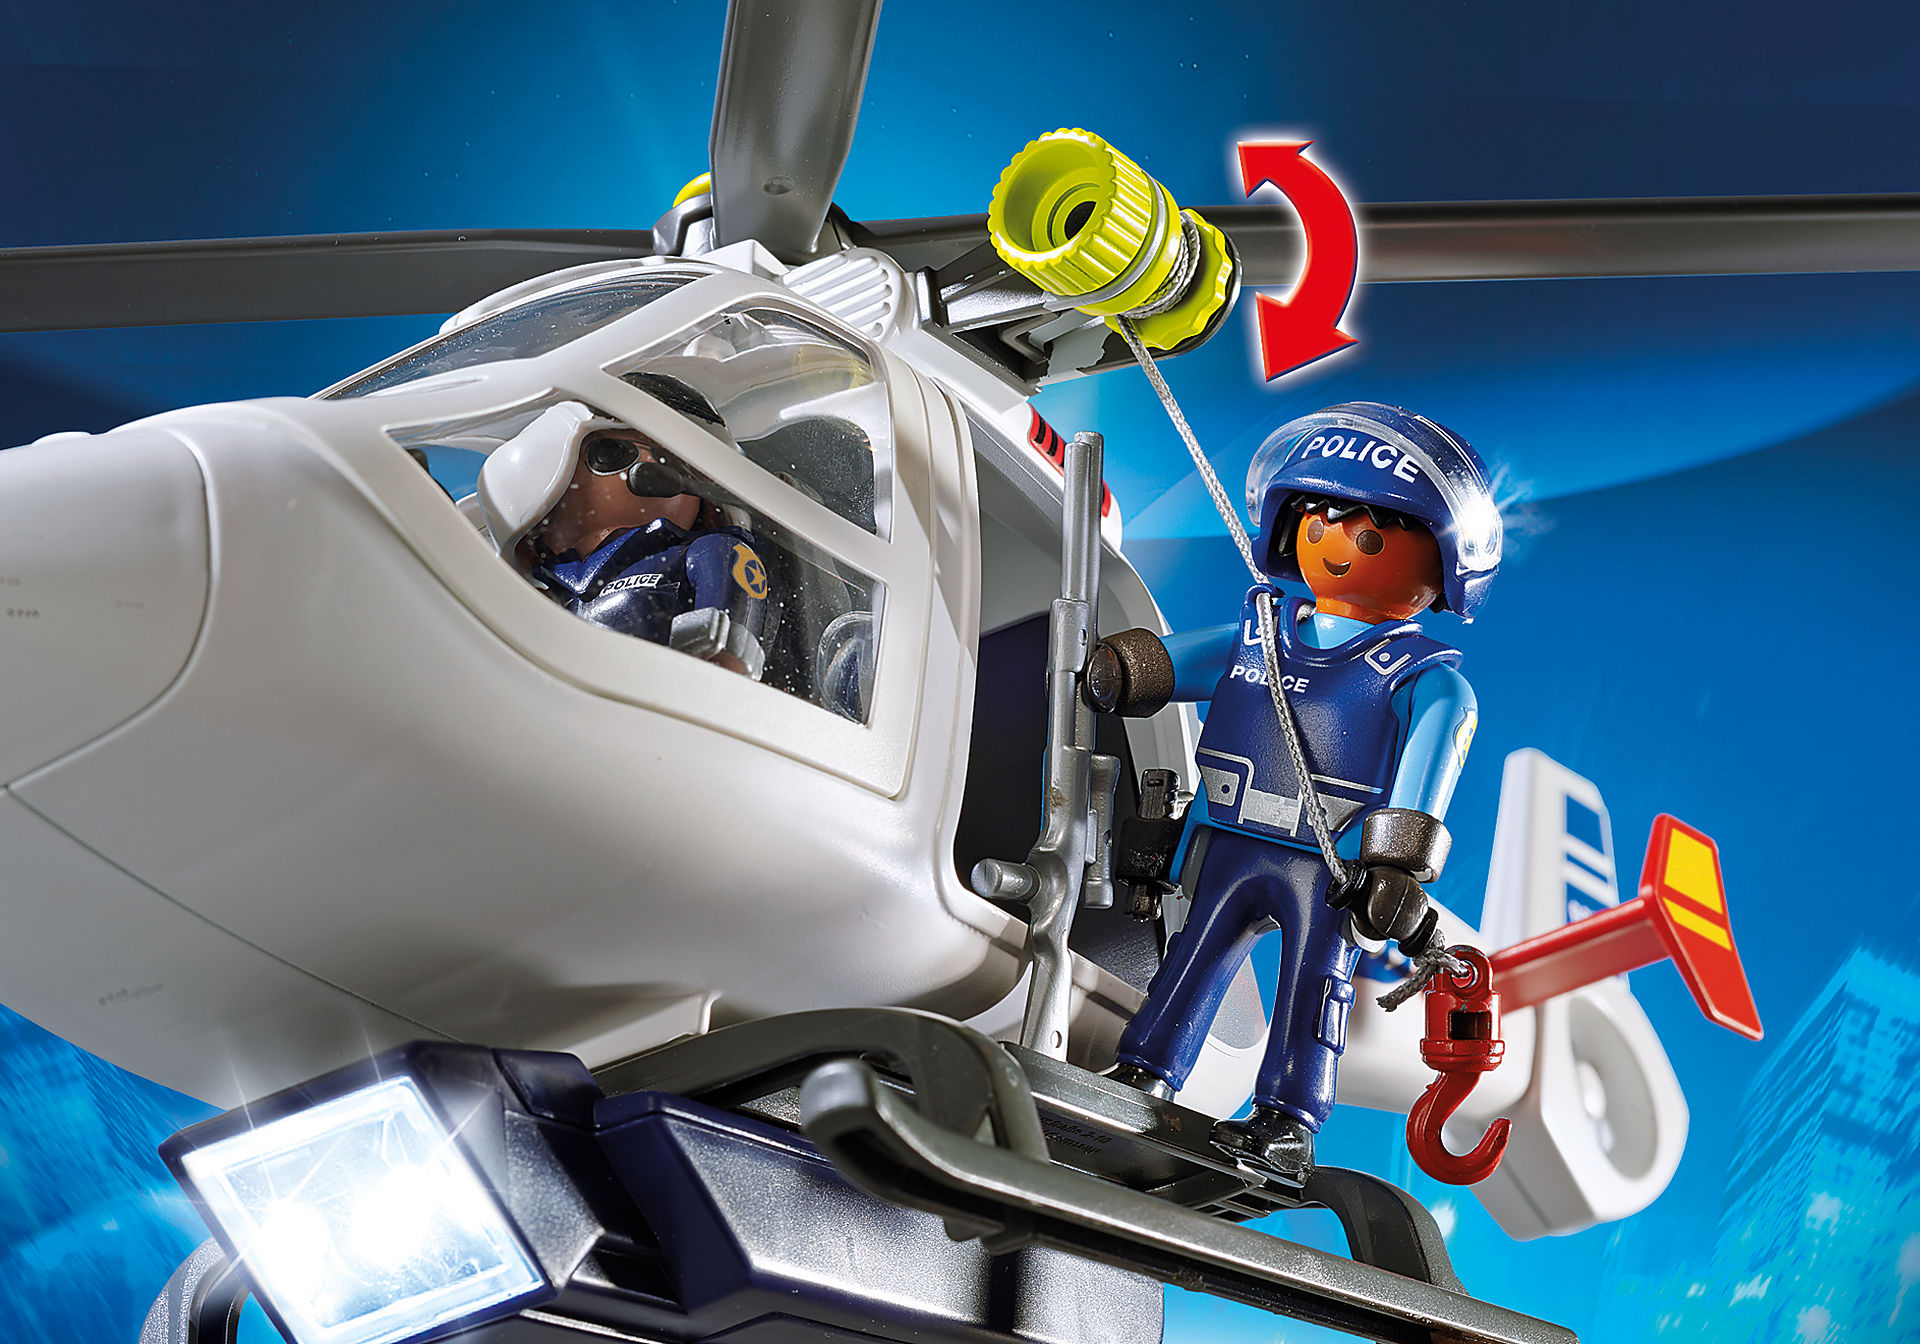 6921 Helicóptero de Policía con Luces LED zoom image5